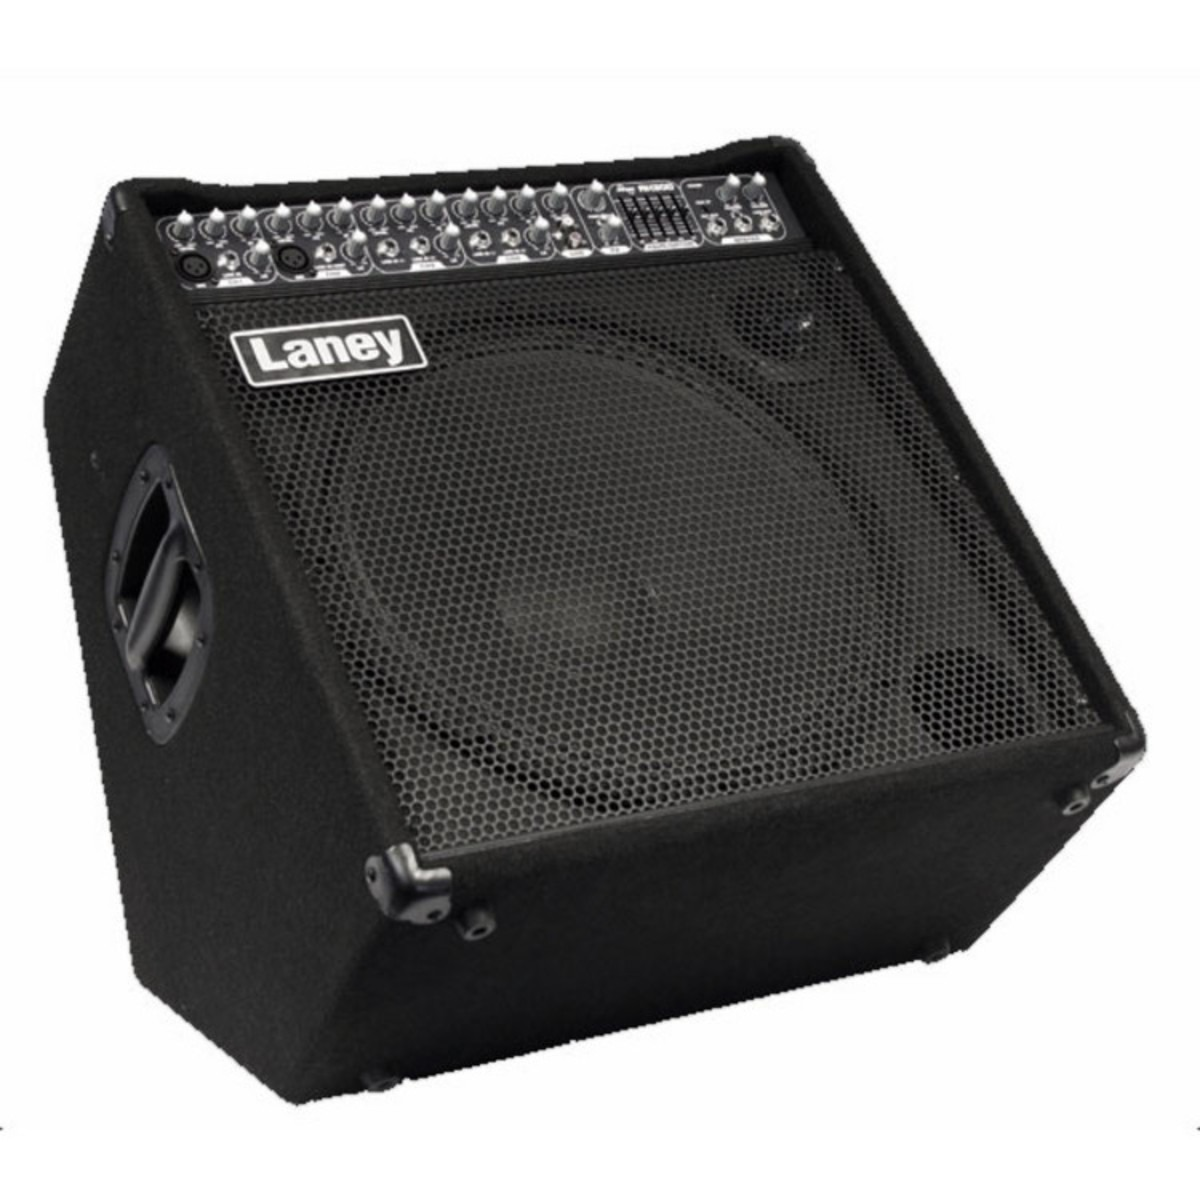 Amplificador Laney Ah300 Combo Multiuso 300w 1x15  + Tweeter